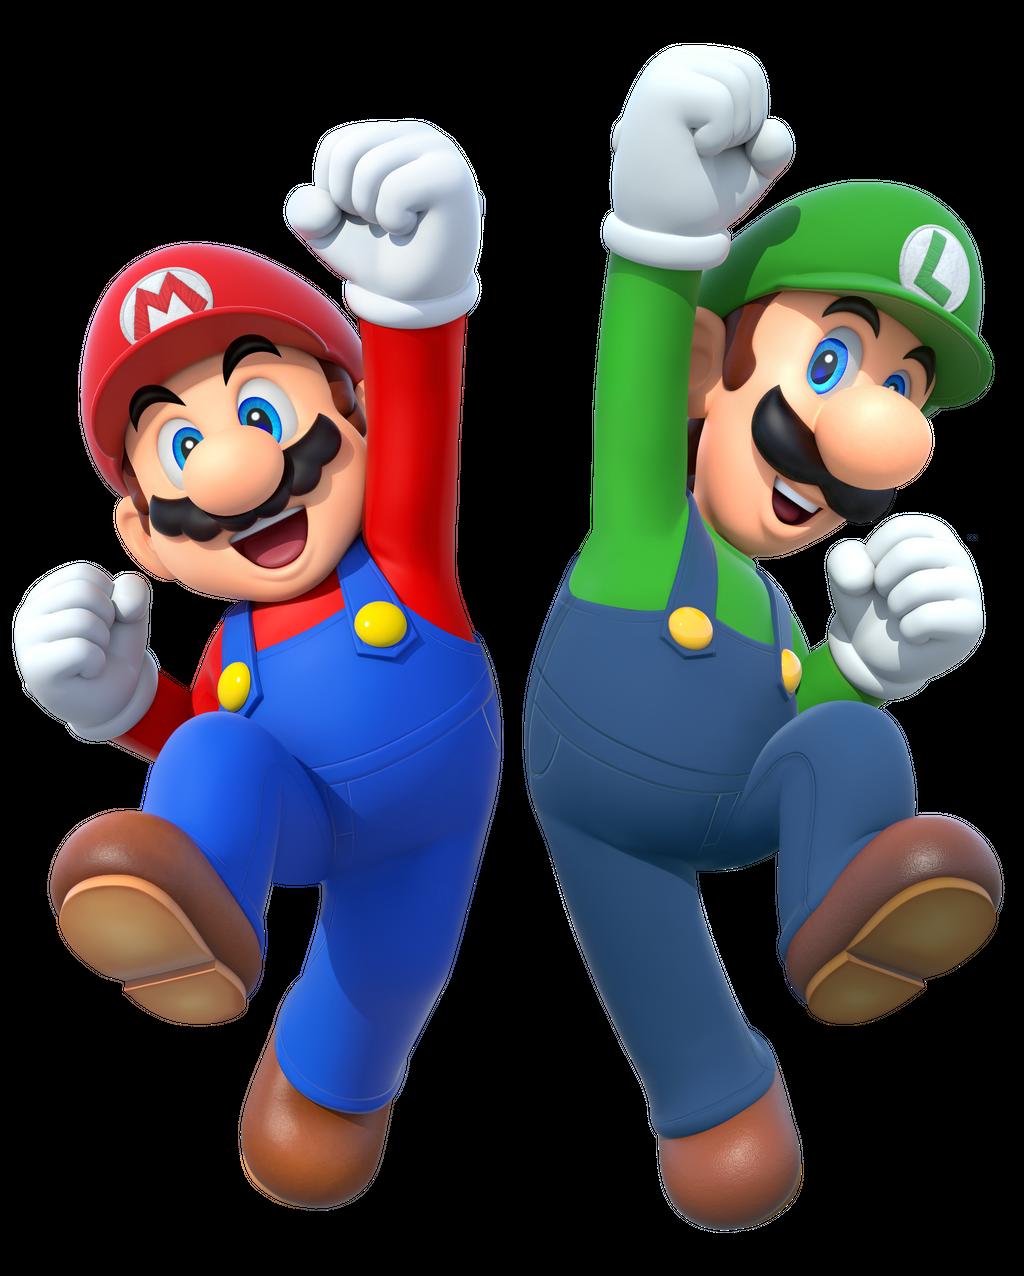 Mario And Luigi 2015 Render By Banjo2015 On Deviantart Super Mario Kunst Mario Und Luigi Super Mario Bros